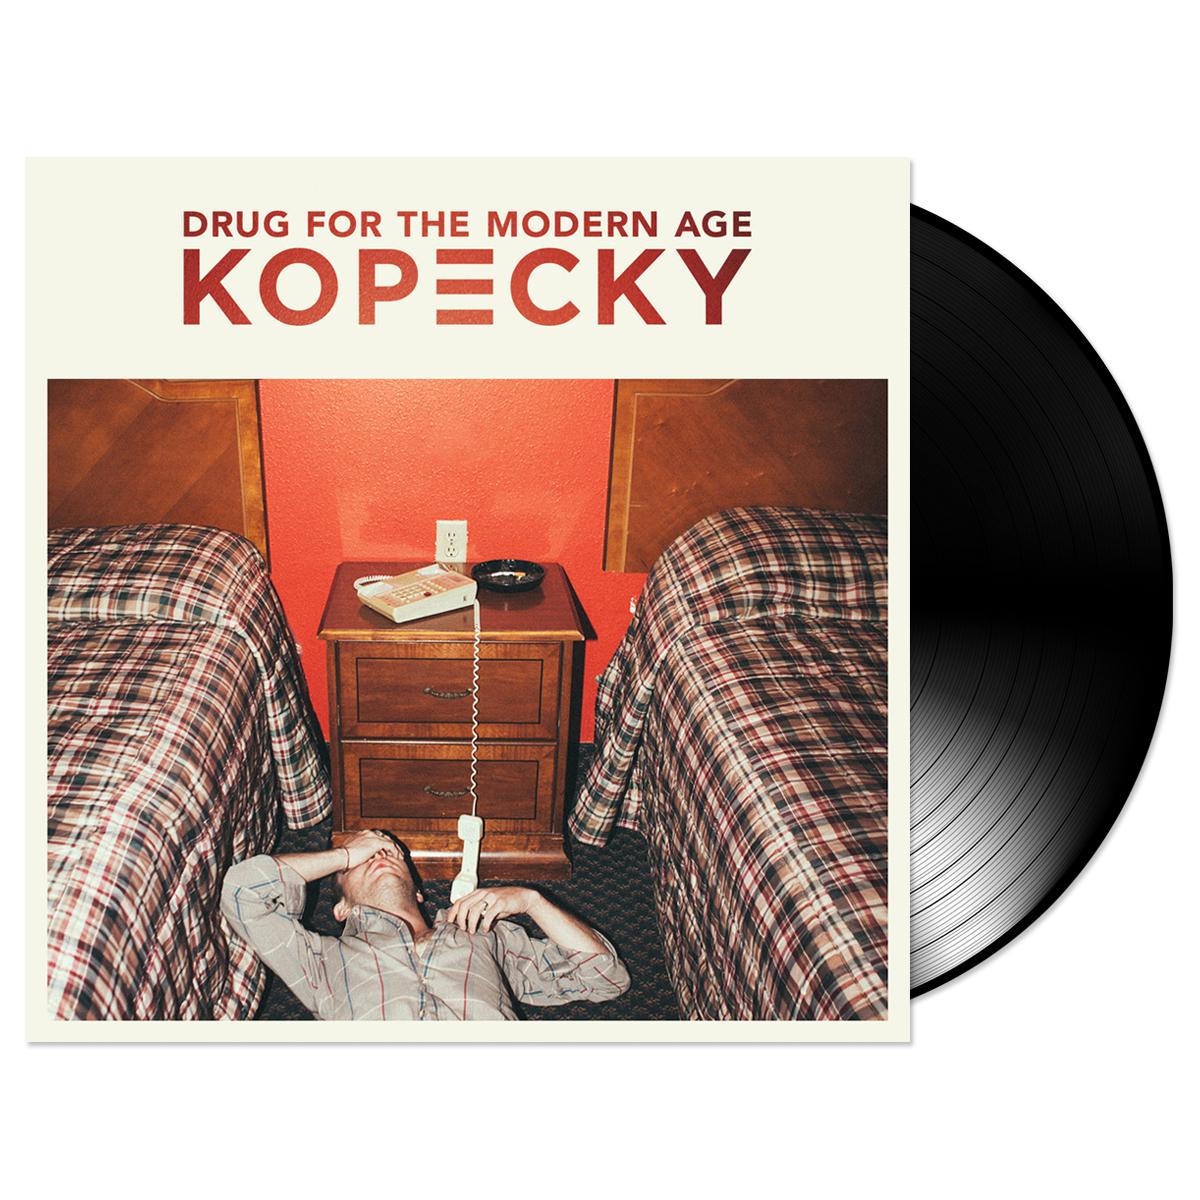 Kopecky - Drug for the Modern Age LP